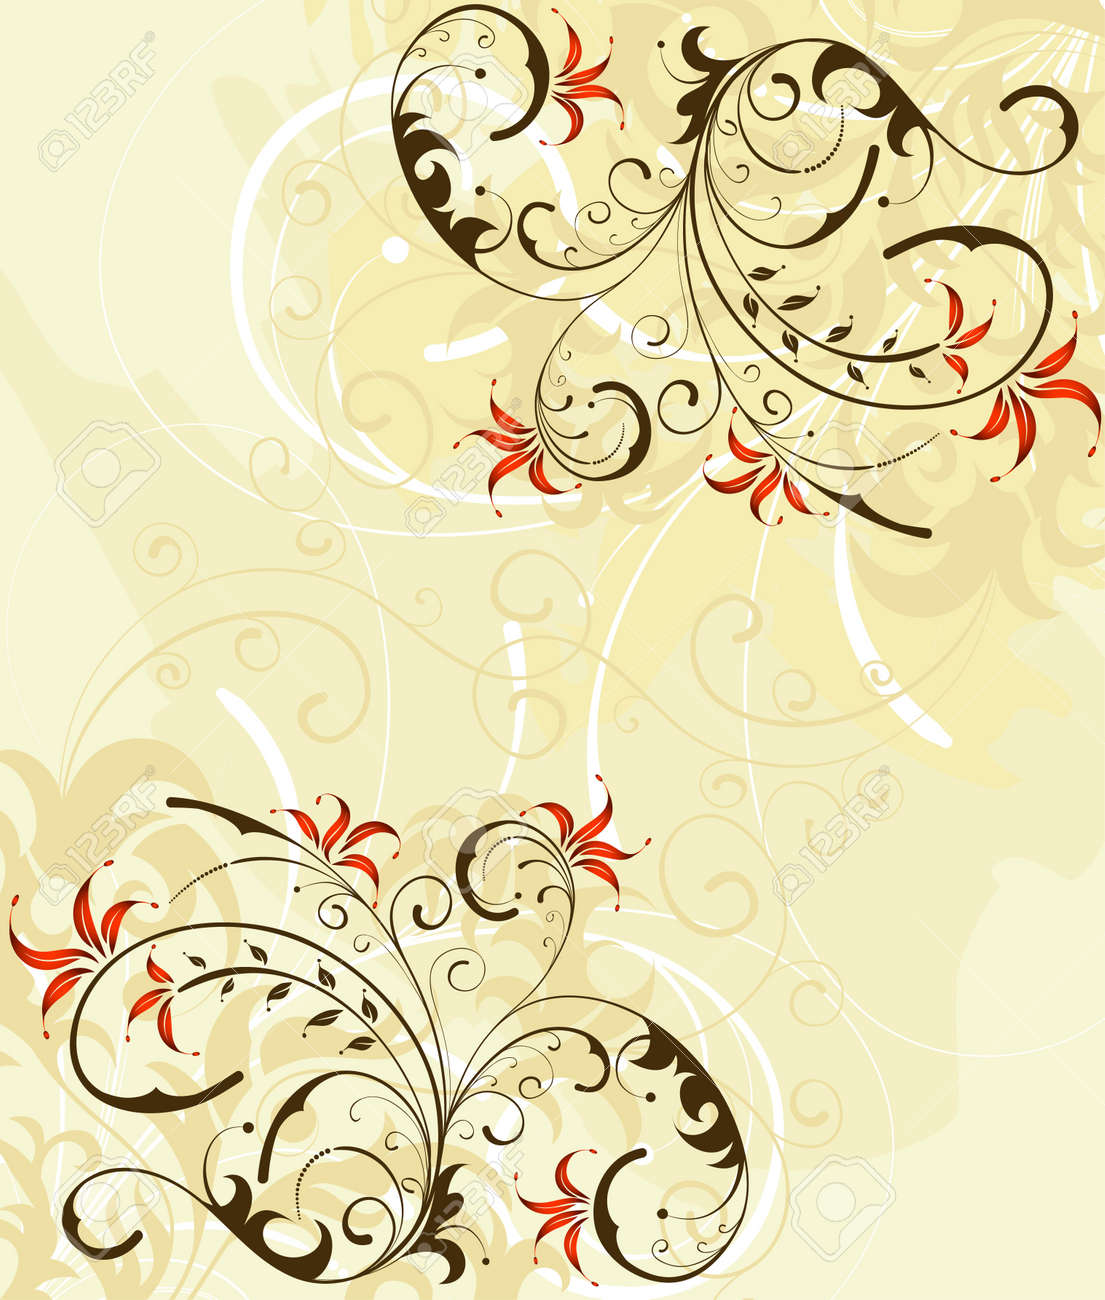 Grunge paint flower background, element for design, vector illustration Stock Illustration - 1261236